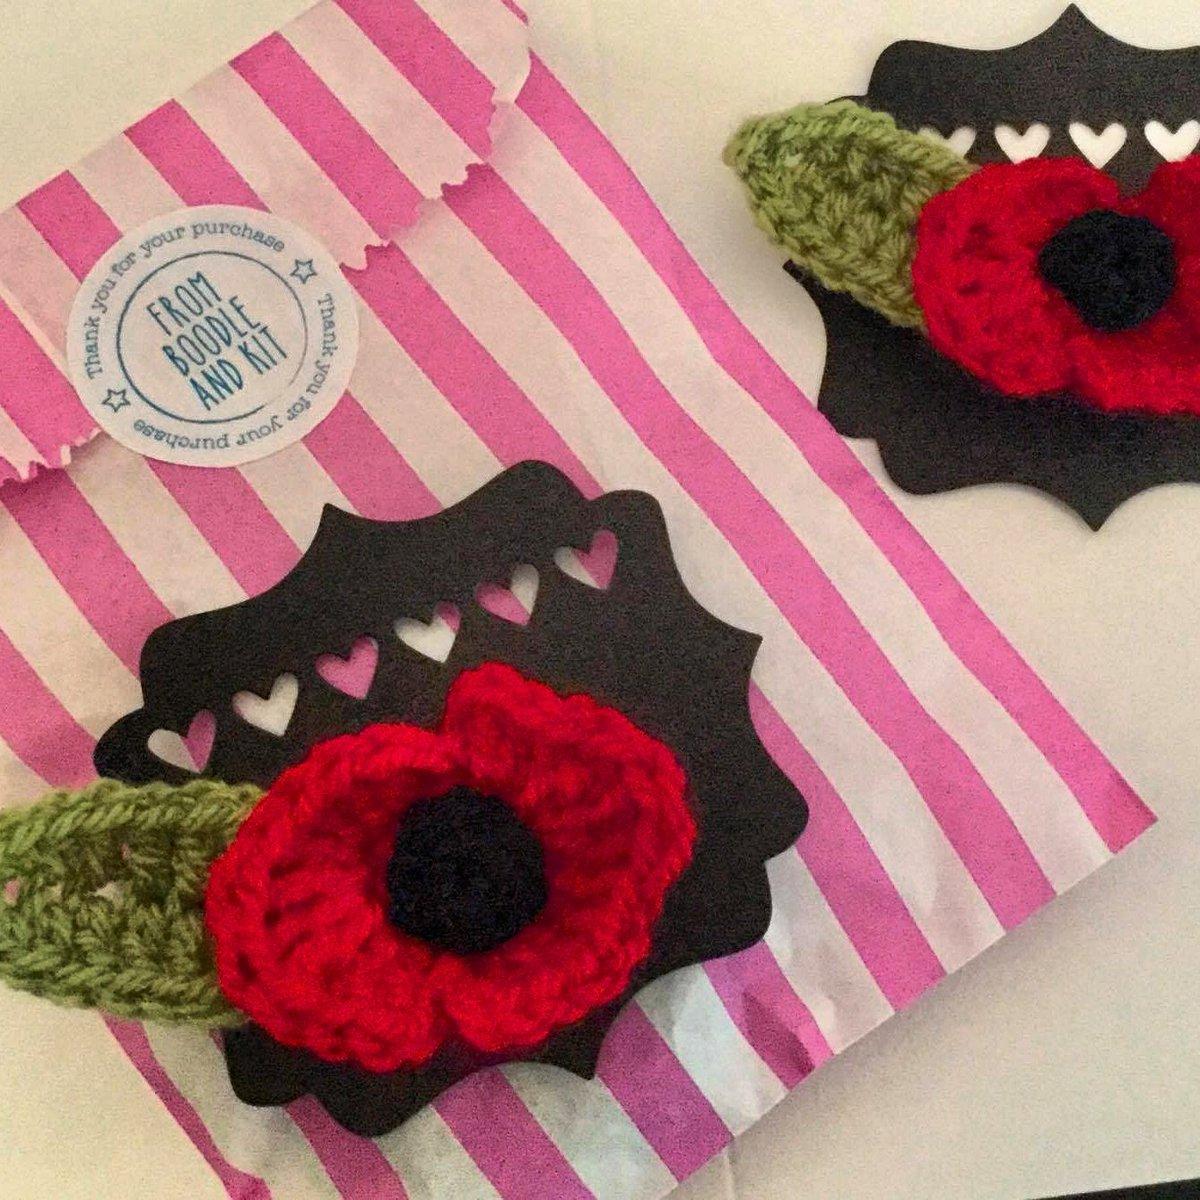 Beautiful handmade crochet poppies available at  http://www. etsy.com/uk/shop/boodle andkit &nbsp; …  #remembranceday #poppyappeal #poppies #crochet #handmade #ukbiz <br>http://pic.twitter.com/G2U9GNIvAy